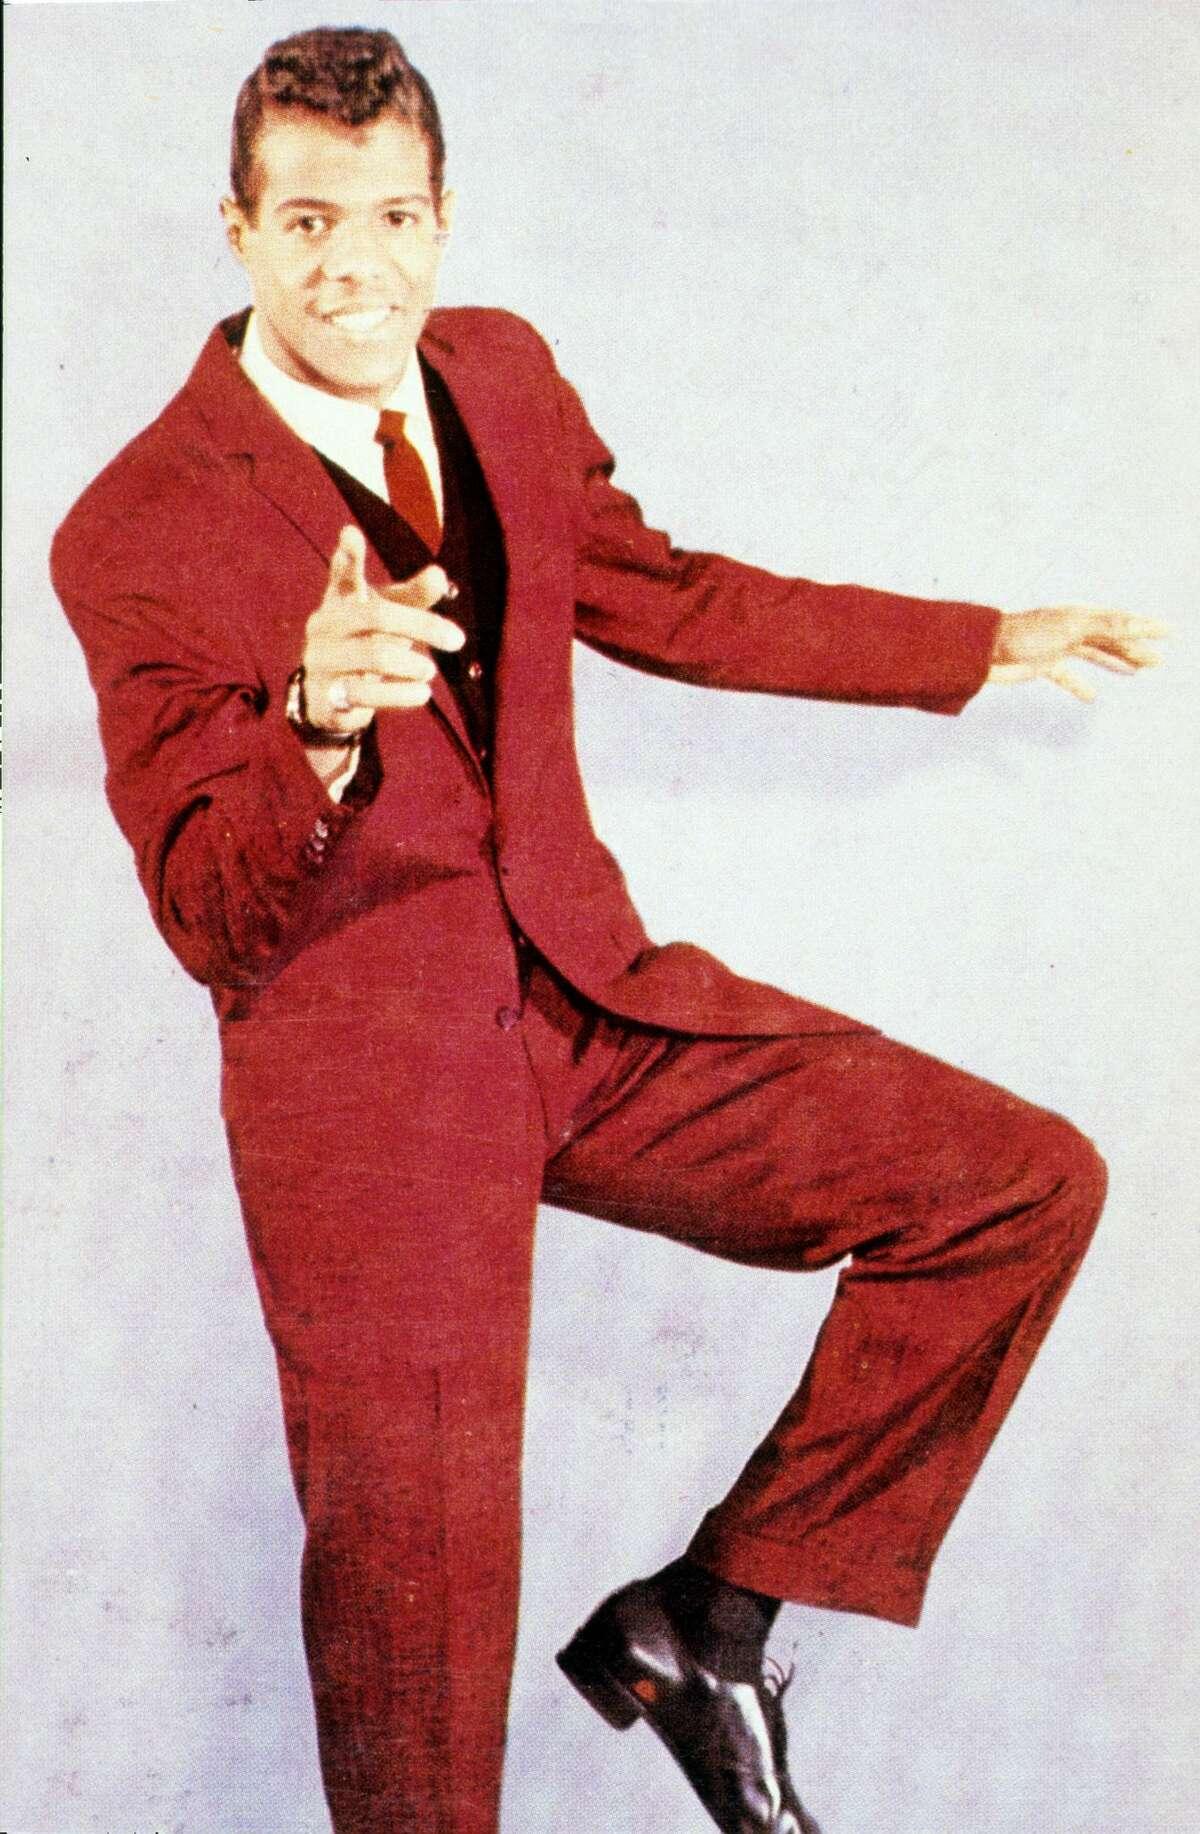 Bobby Freeman, portrait, circa 1960. (Photo by GAB Archive/Redferns)